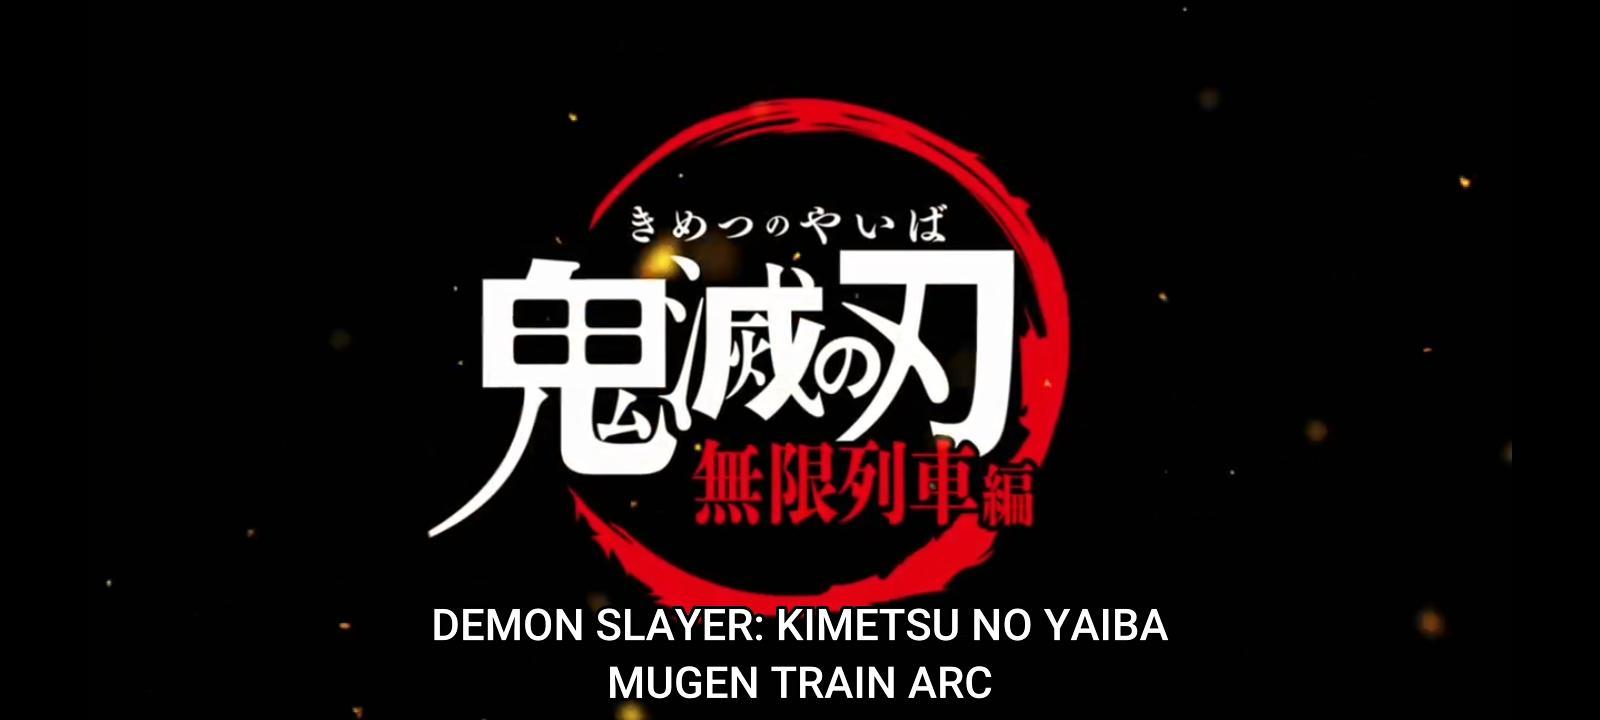 Demon Slayer Mugen Train Arc Visual